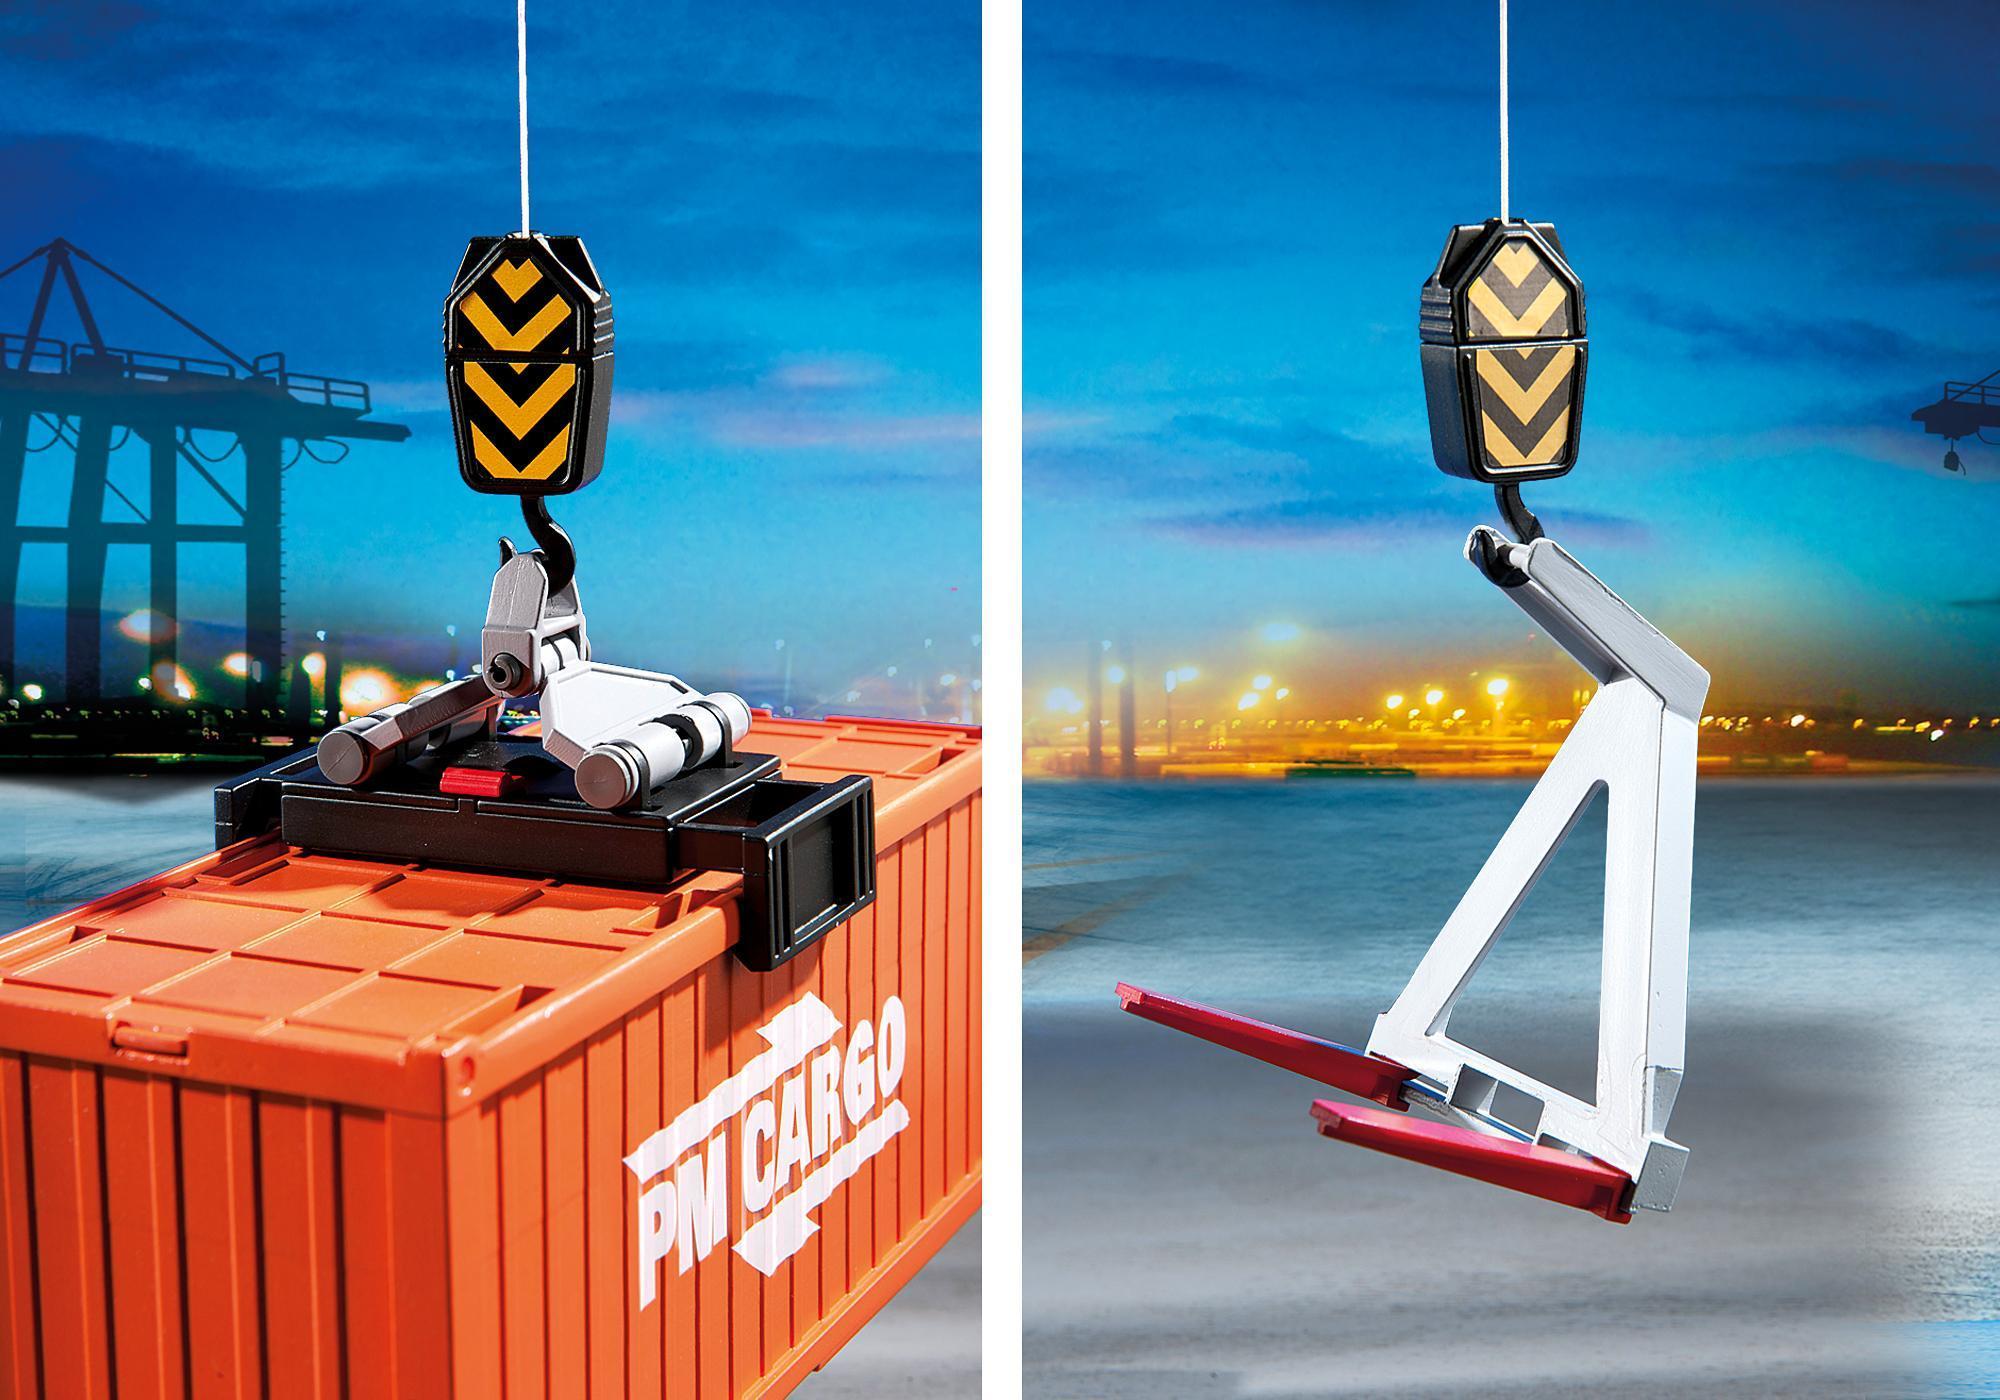 http://media.playmobil.com/i/playmobil/5254_product_extra3/Portique électrique à conteneurs